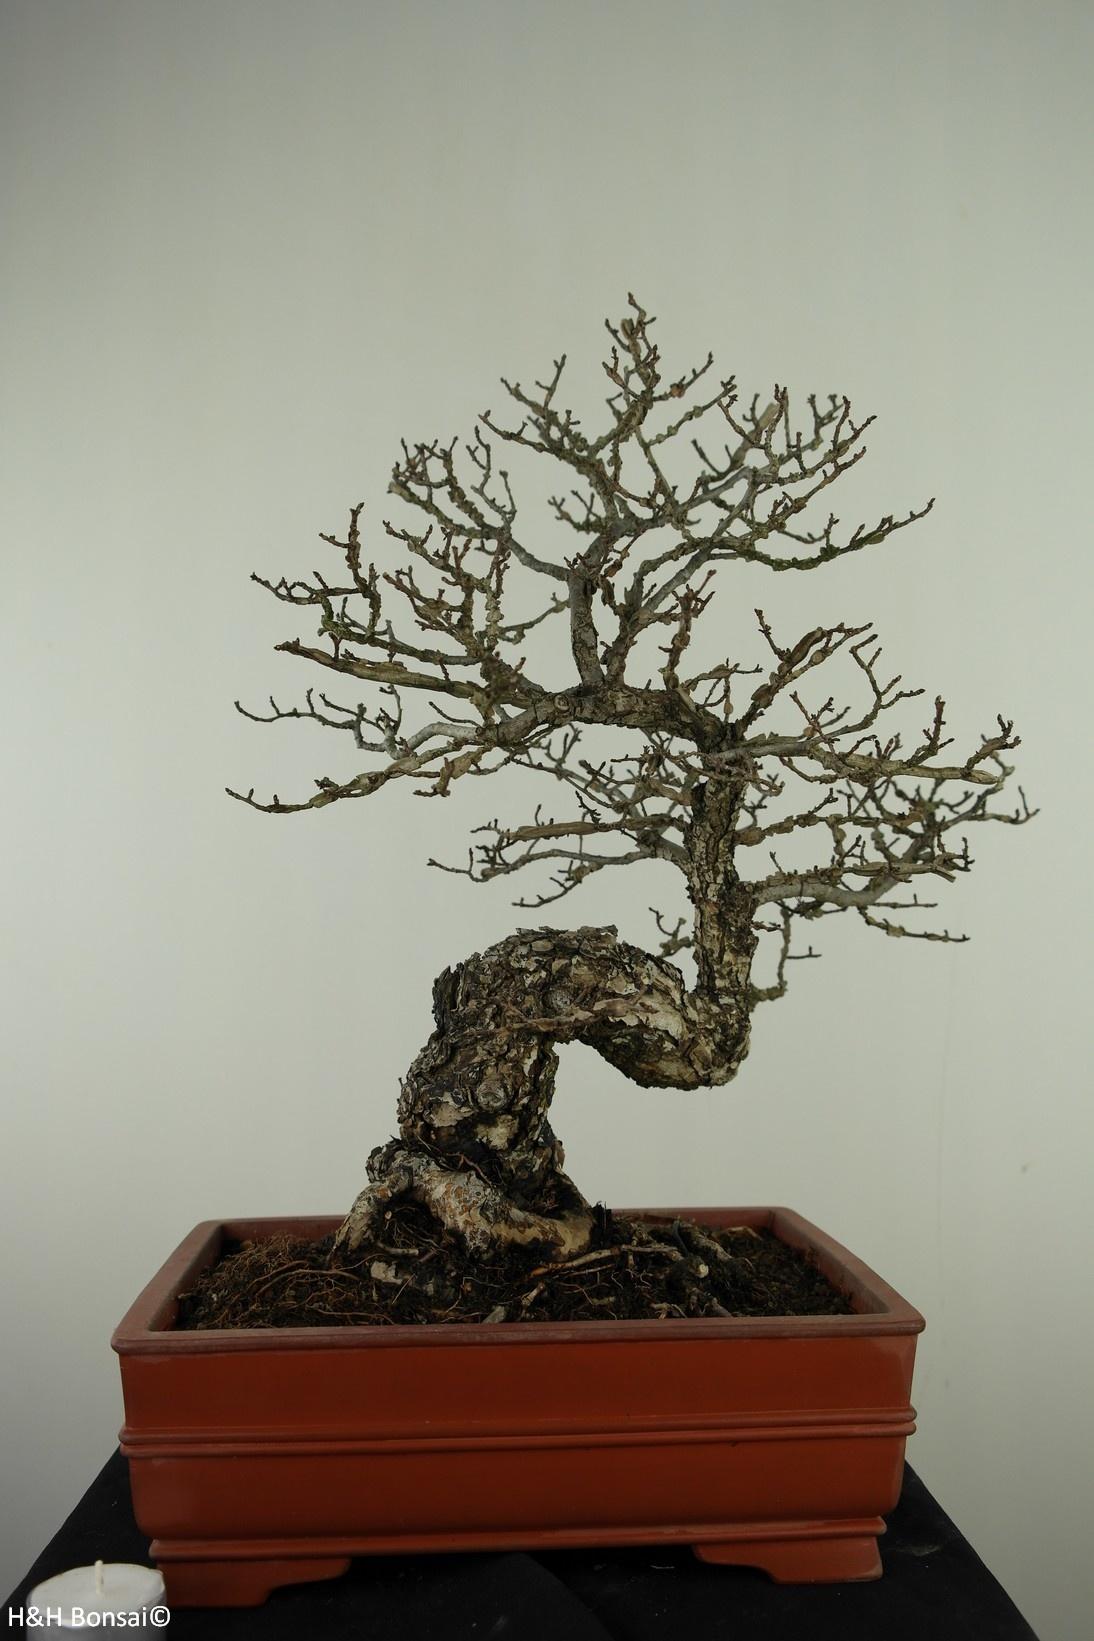 Bonsai Winged Spindle, Euonymus alatus, no. 7514